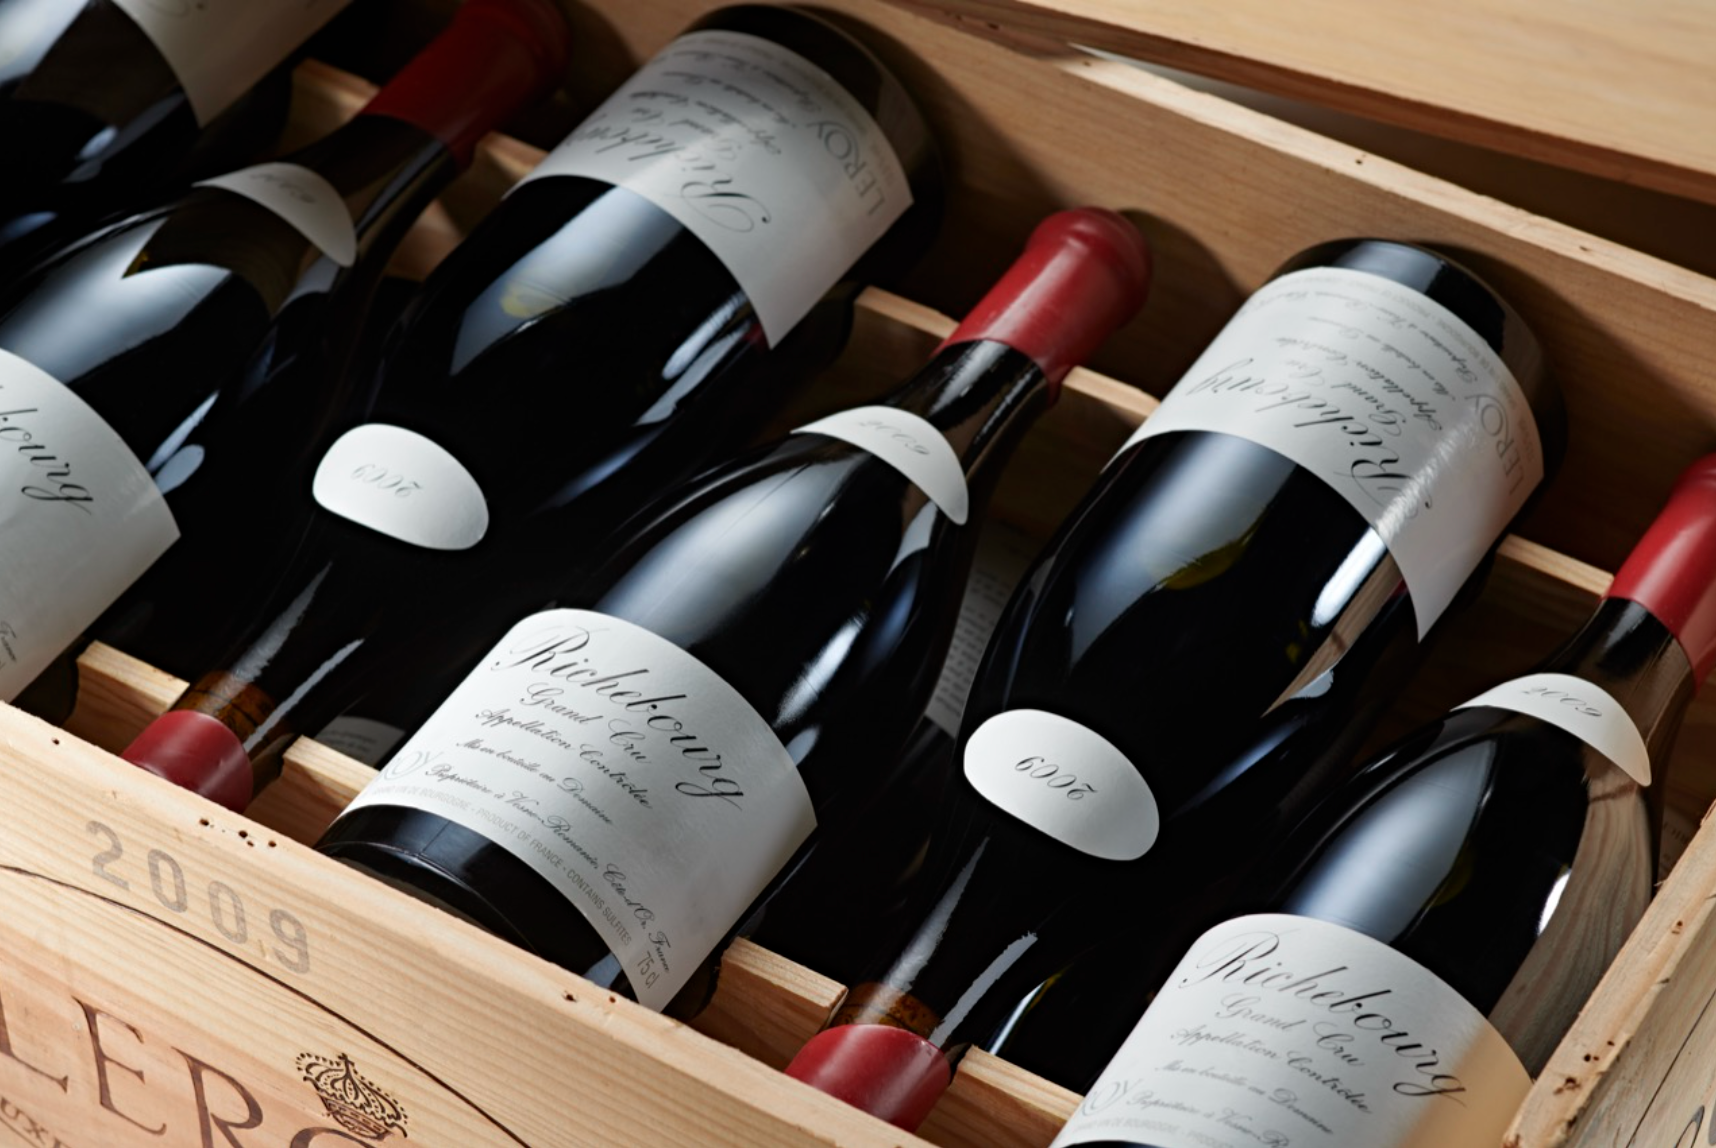 2009 Domaine Leroy Richebourg (12 Bottles)